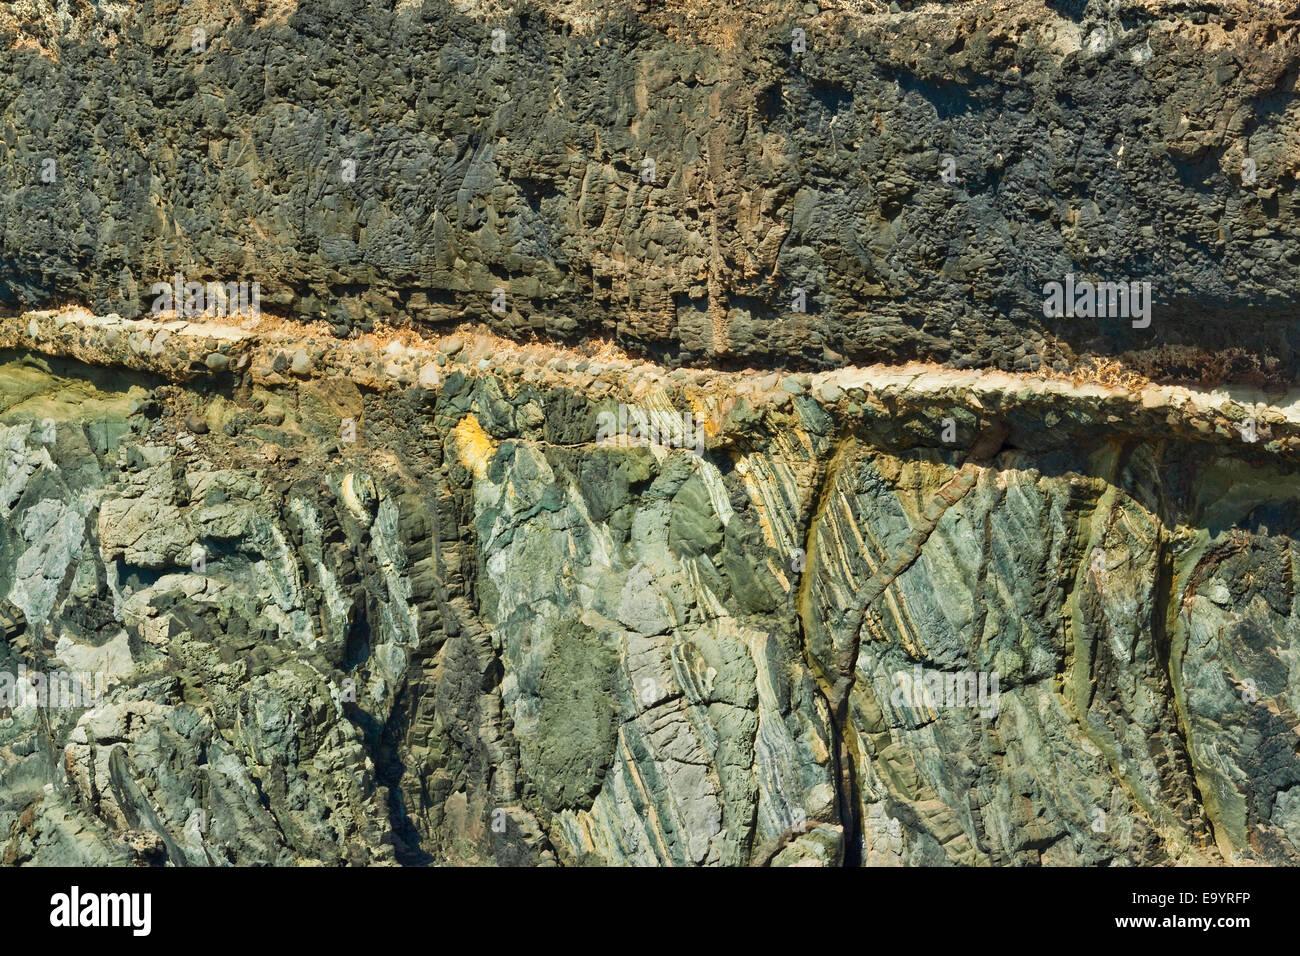 Unconformity of older Jurassic sediments & Pliocene limestone plus later lava on top at Caleta Negra; Ajuy, - Stock Image